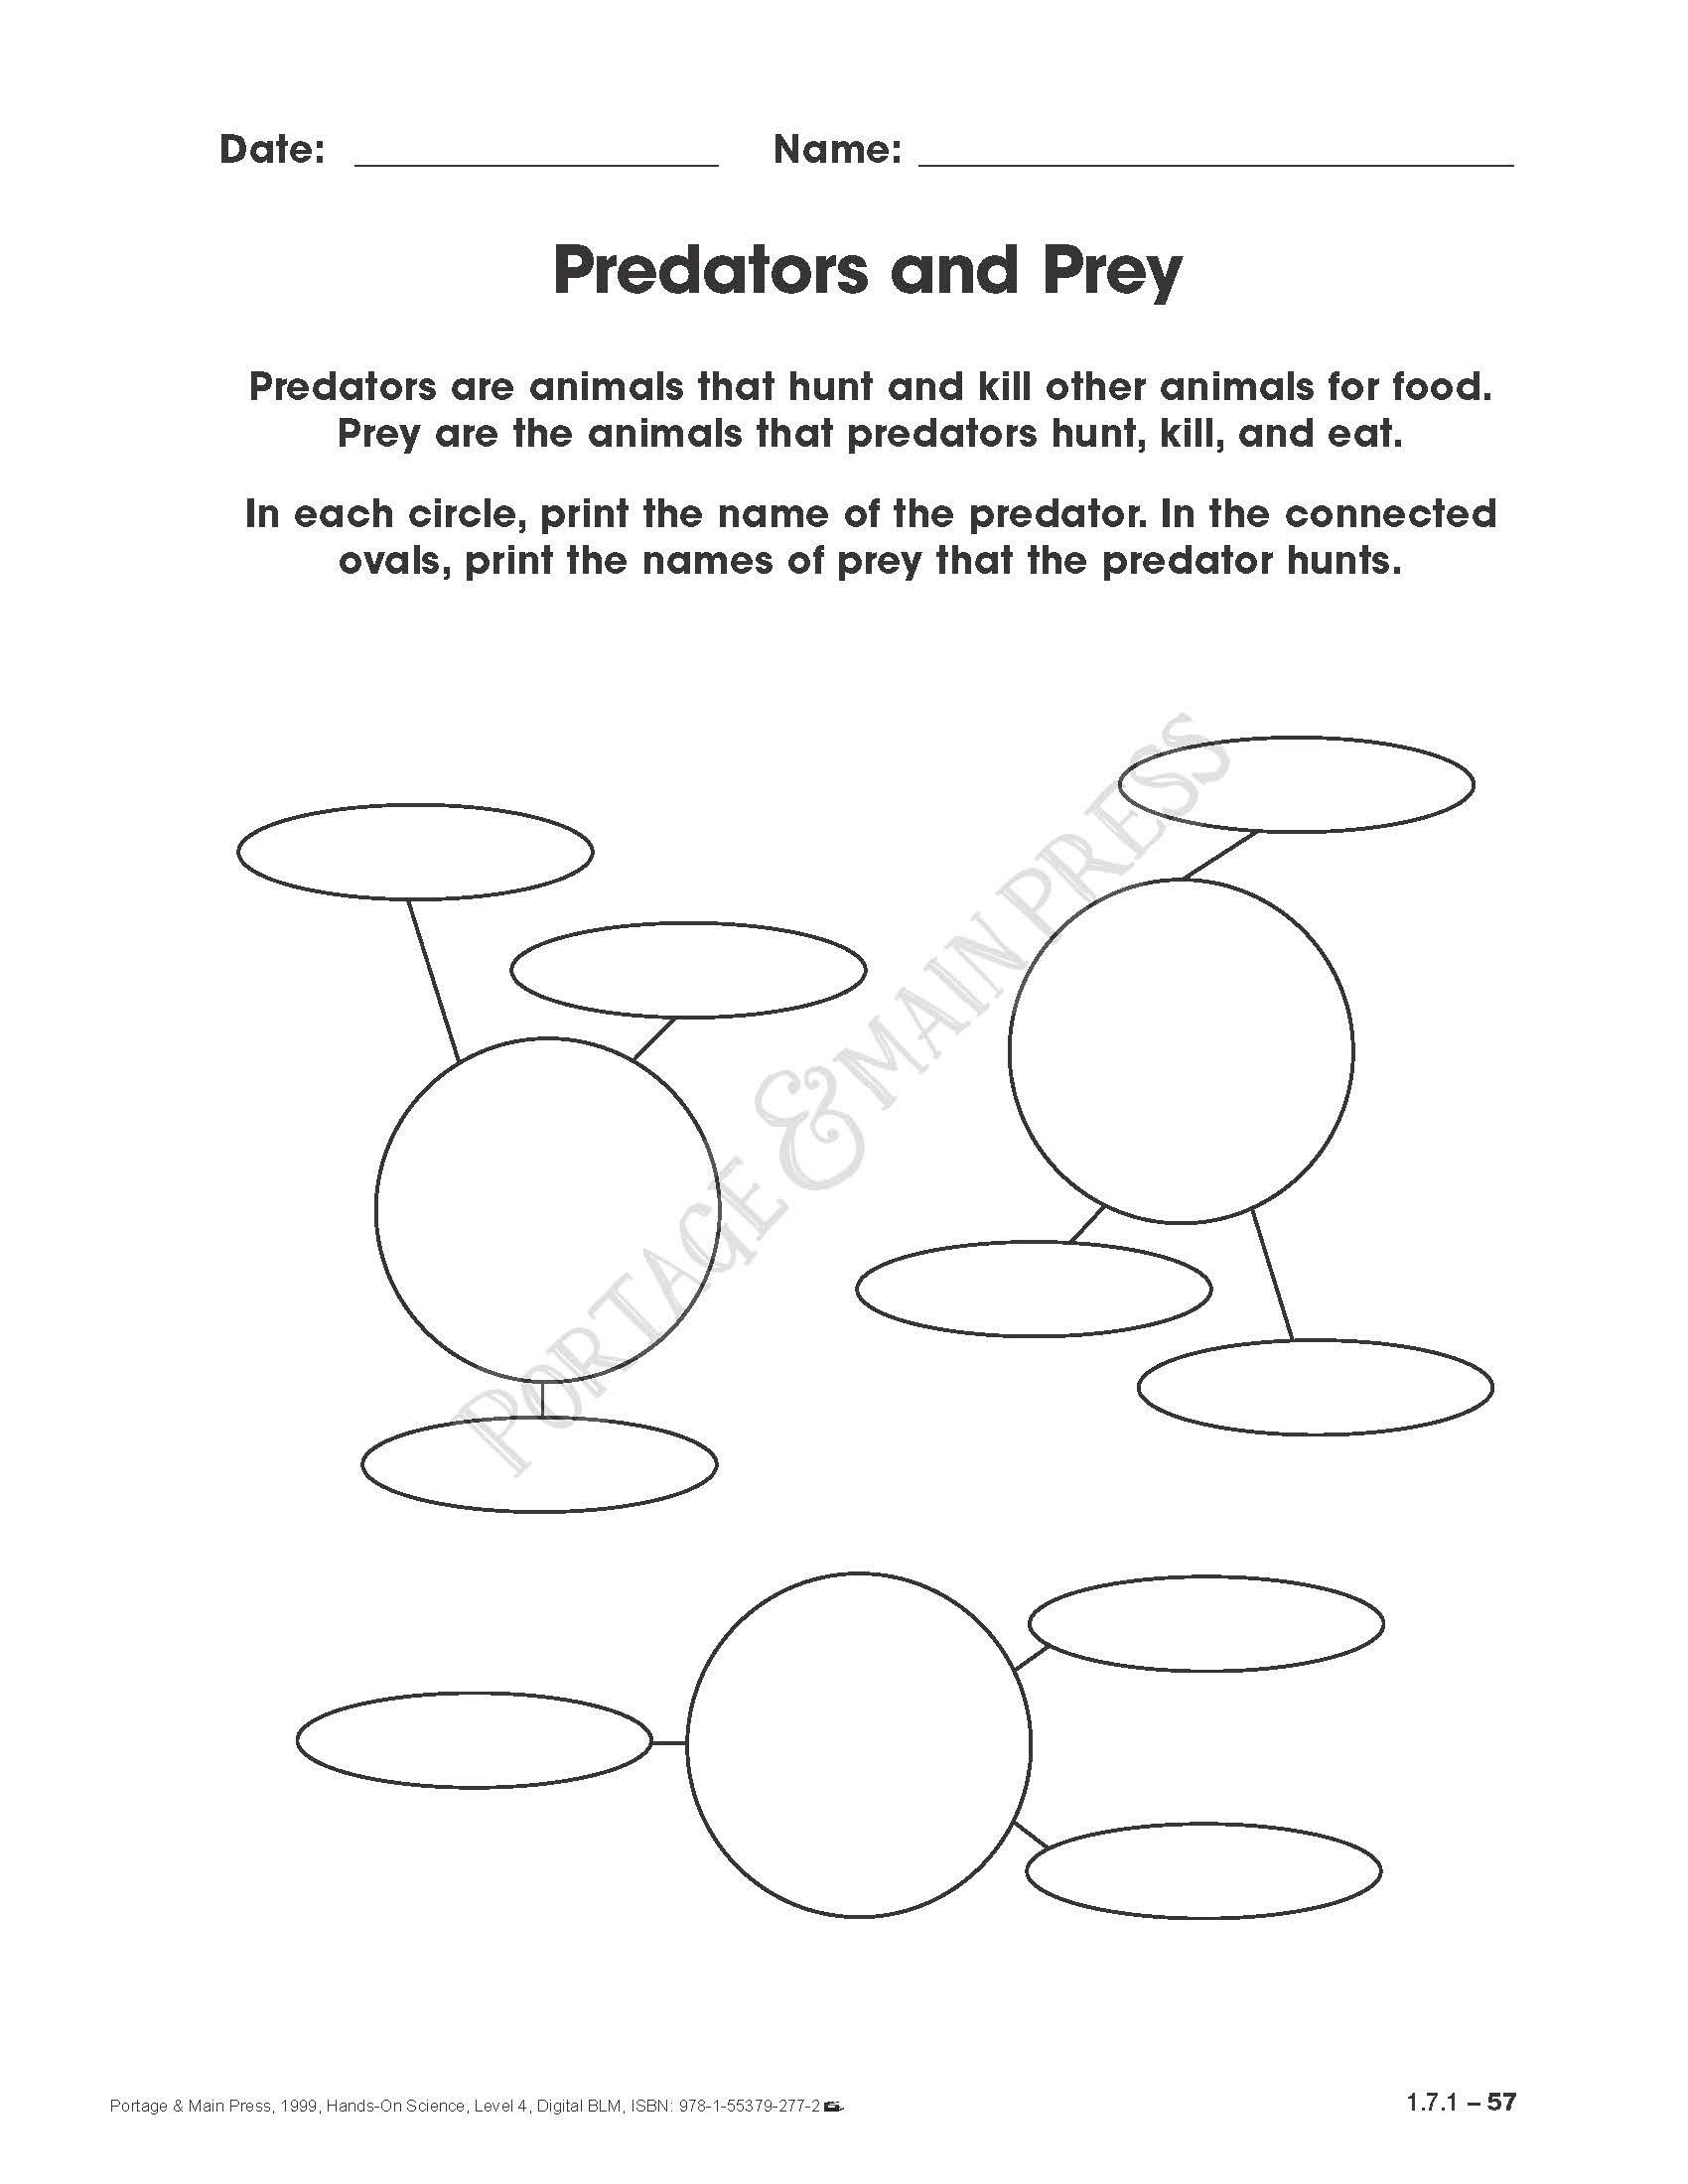 Portage Main Press Educational Books For Teachers Science Skills Kids Worksheets Printables Fun Science